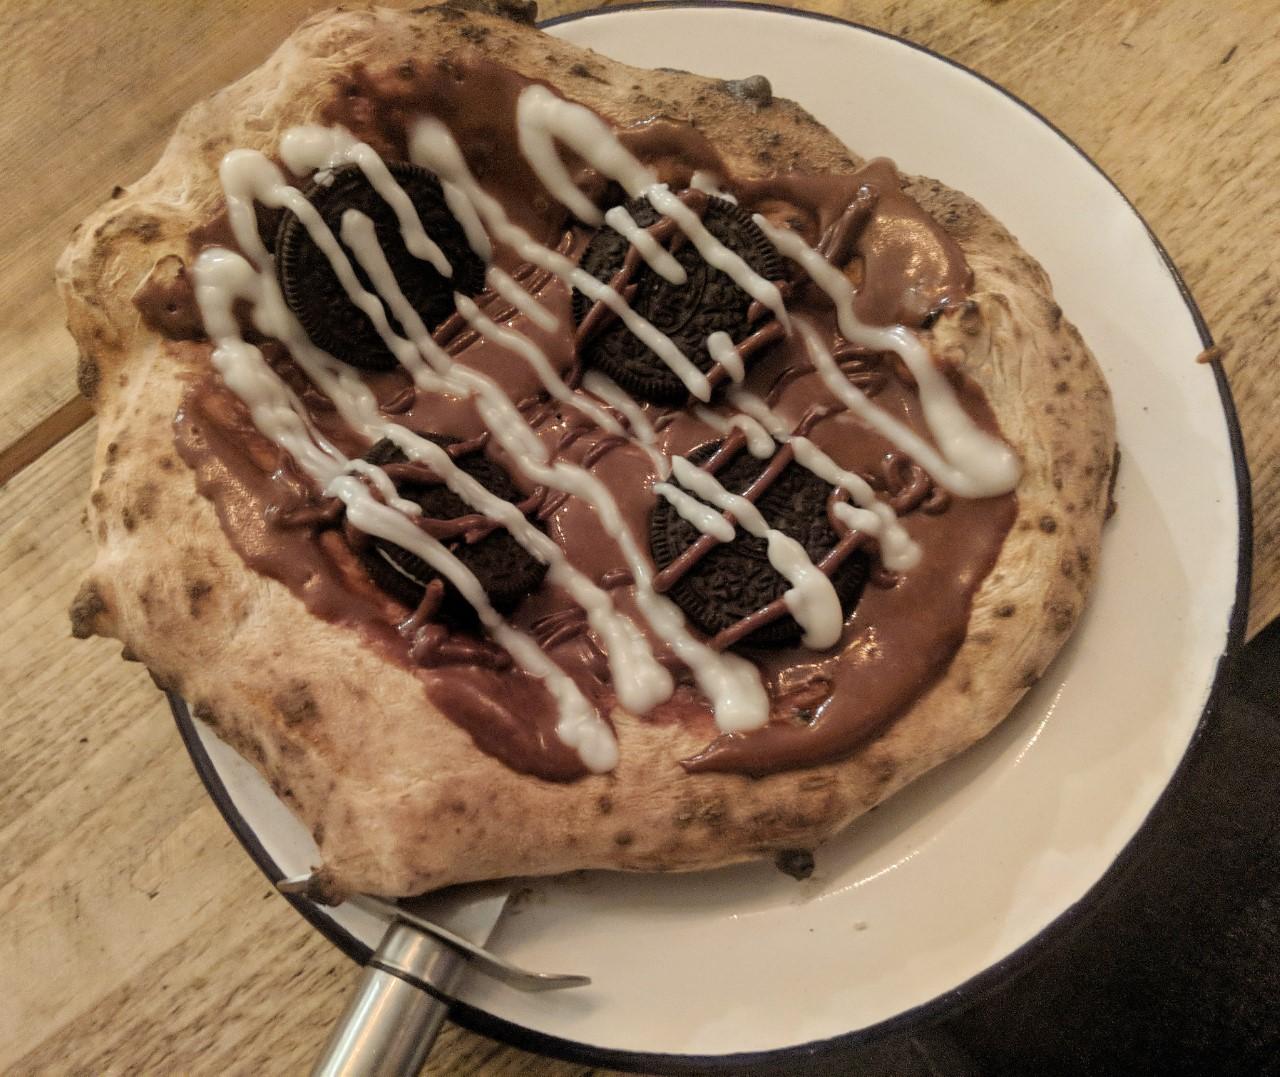 Formidable Joy | Food | Purezza Camden | Purezza | Vegan | Italian | Pizza | Food Review